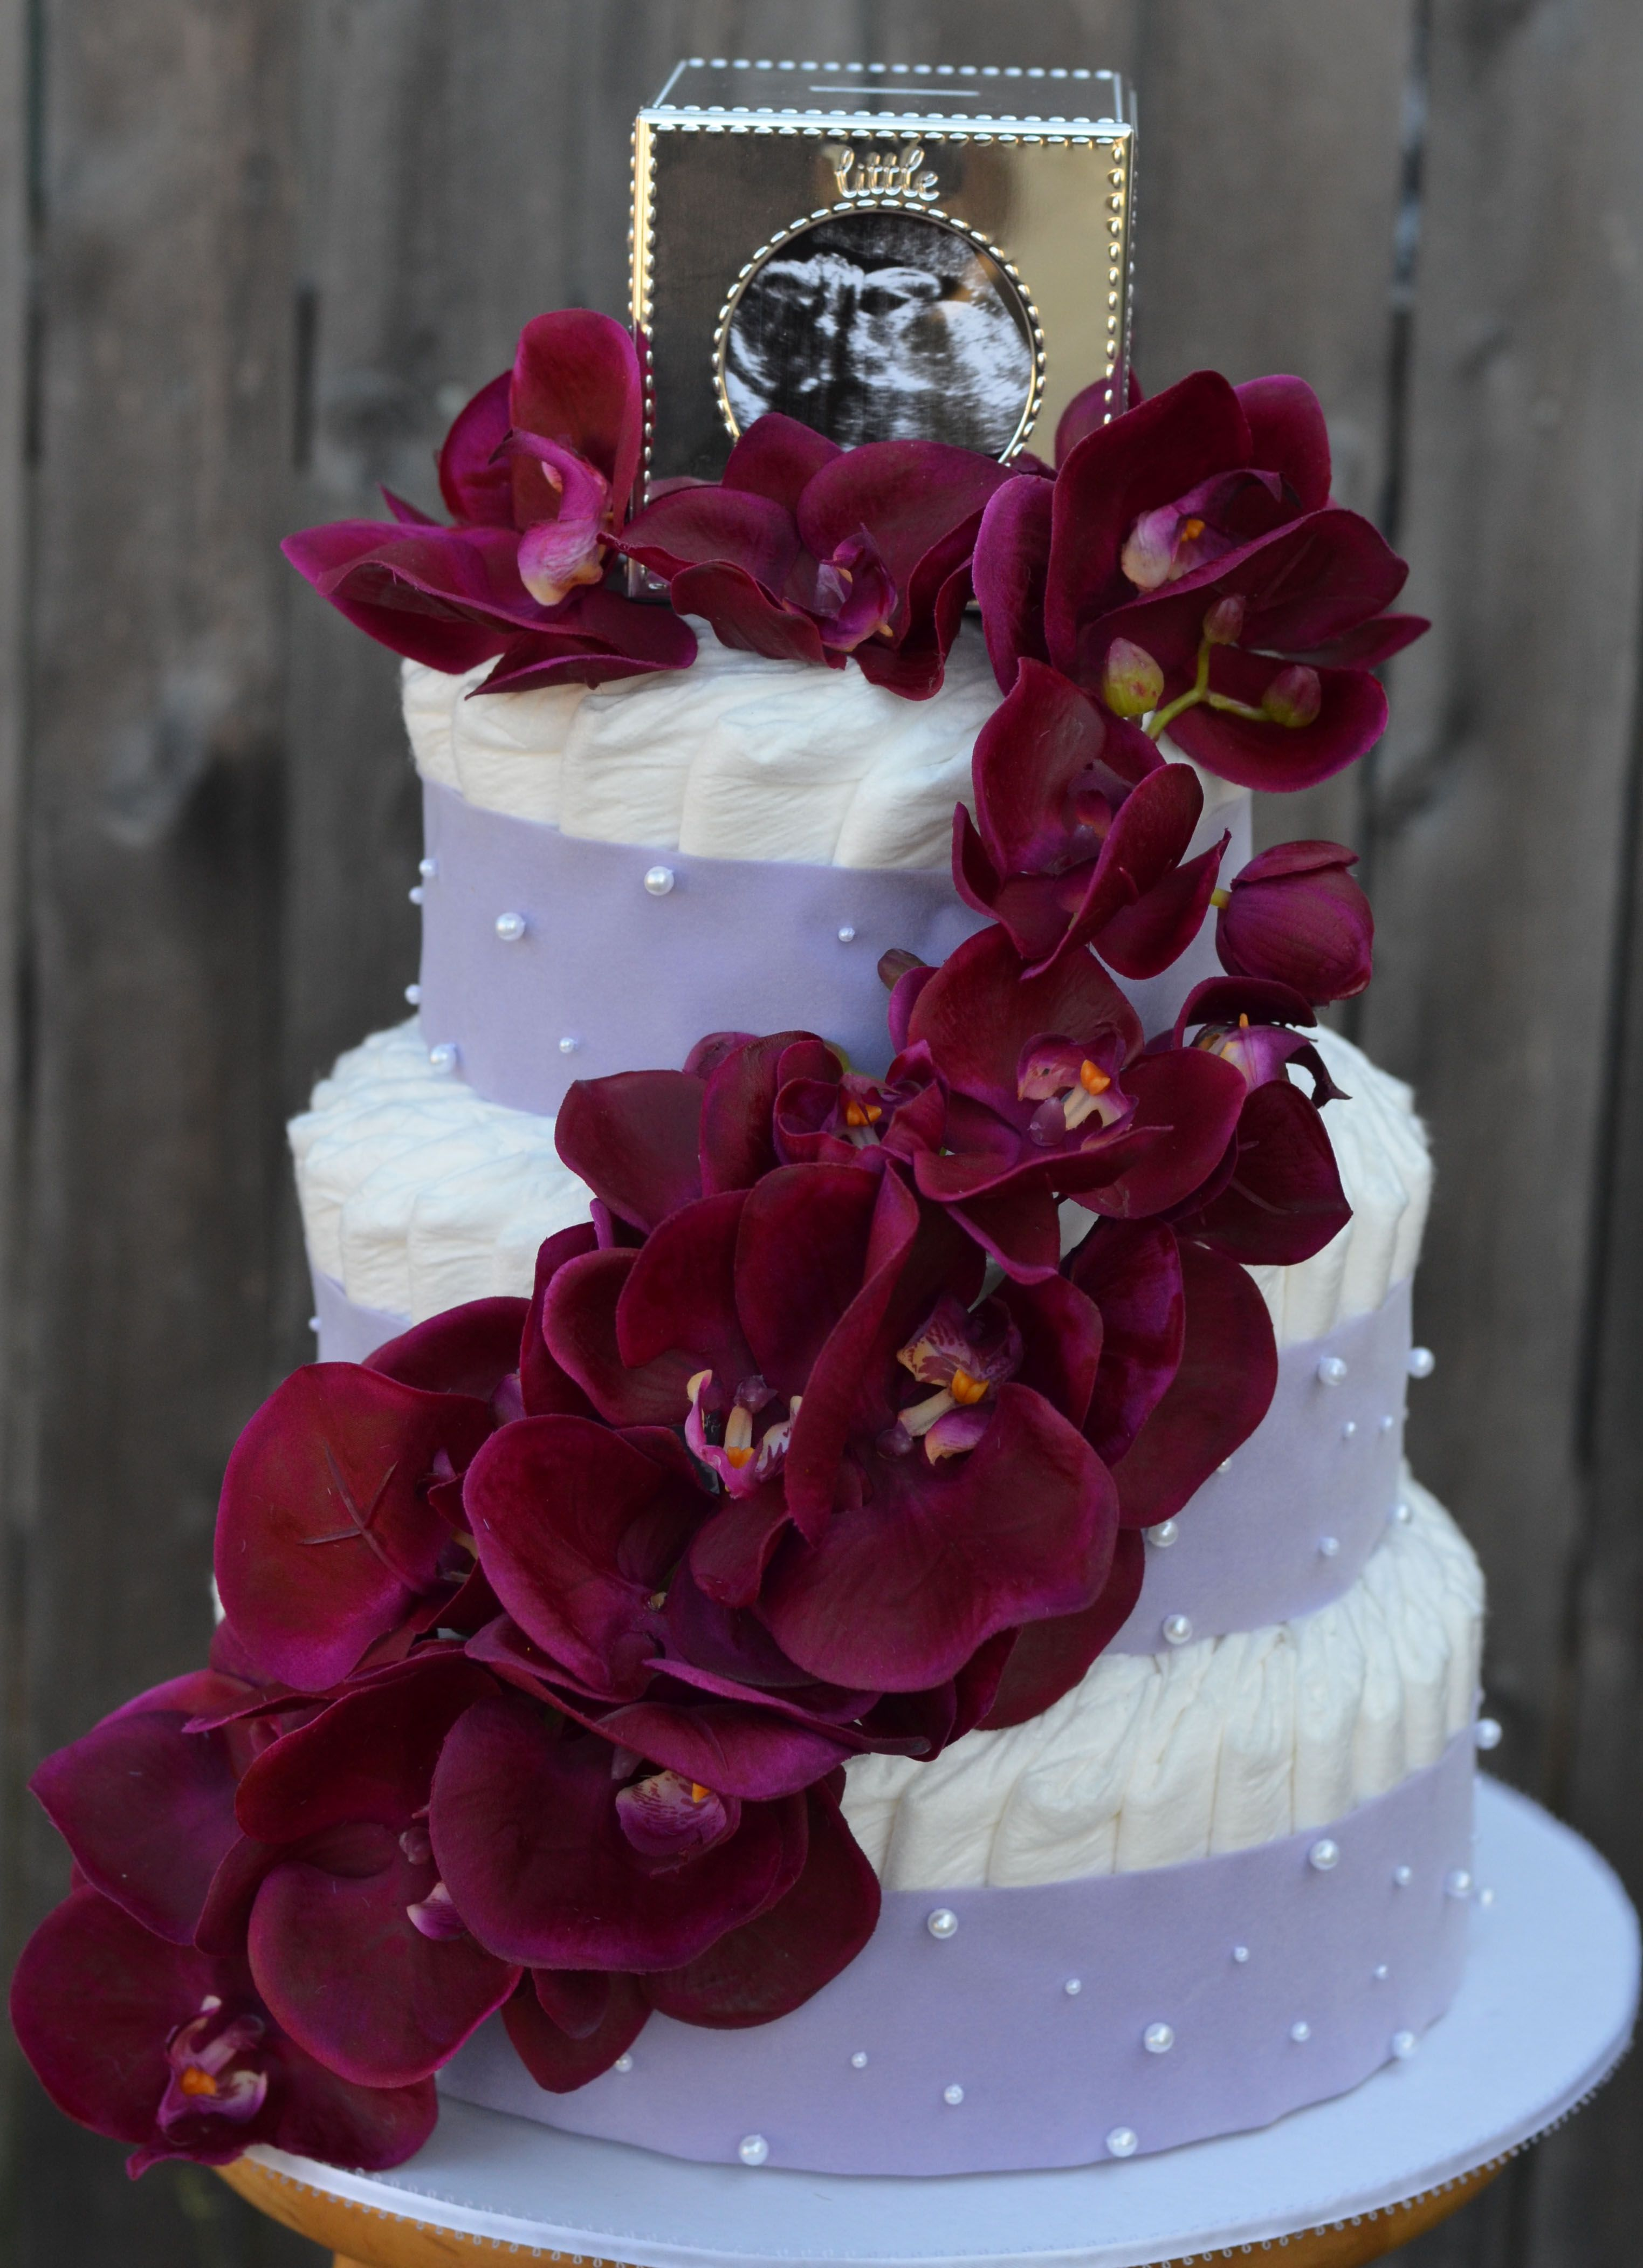 ORCHID 3 TIER DIAPER CAKE